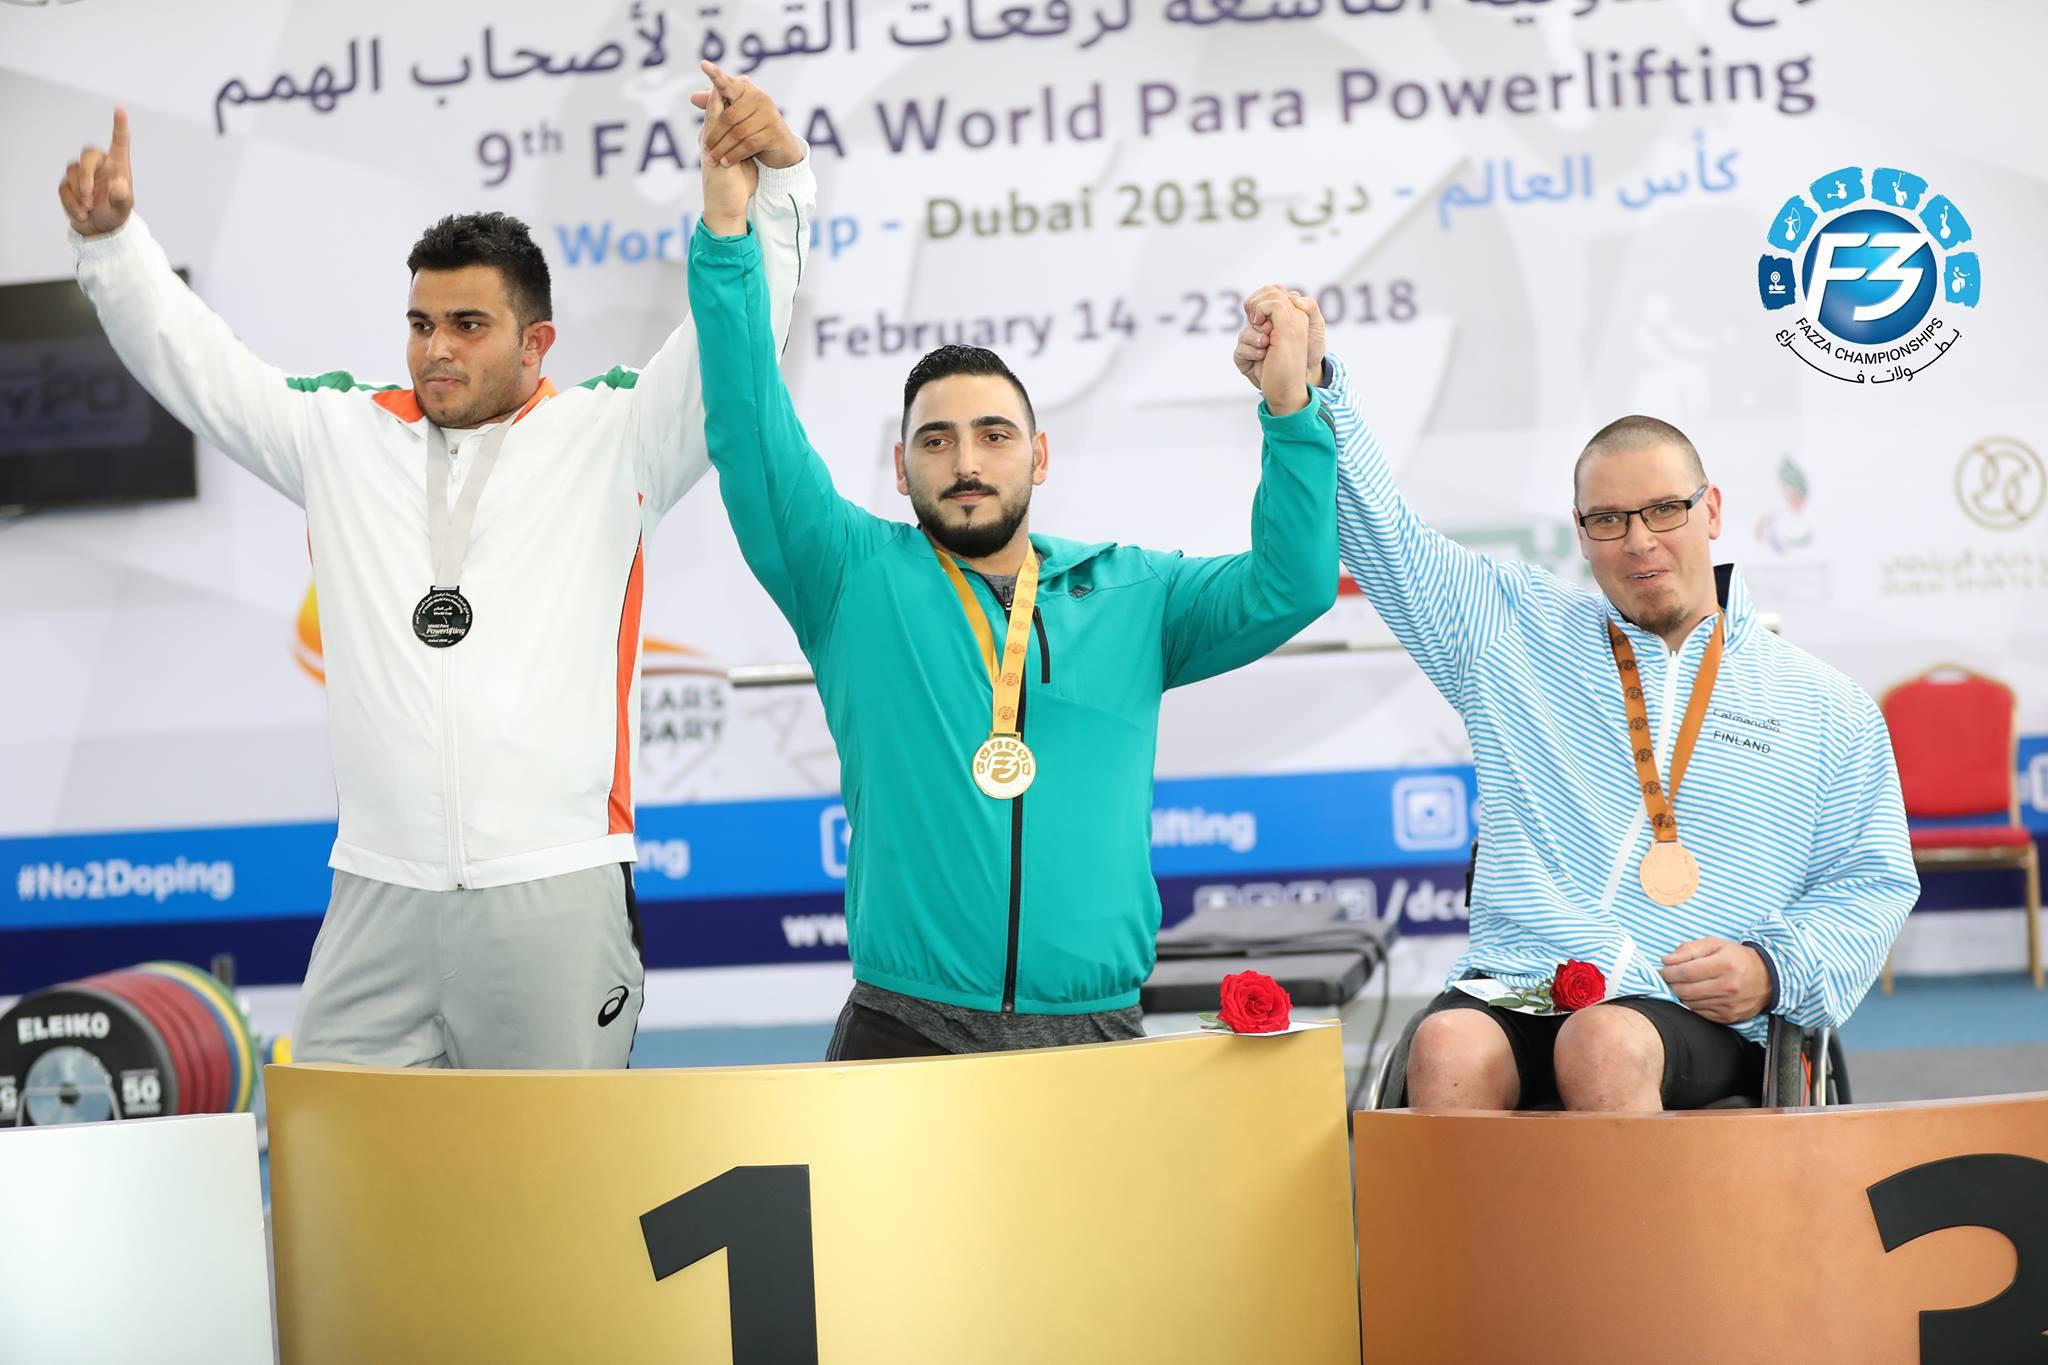 Abdelkareem Khattab claimed gold in the World Para Powerlifting World Cup in Dubai ©IPC